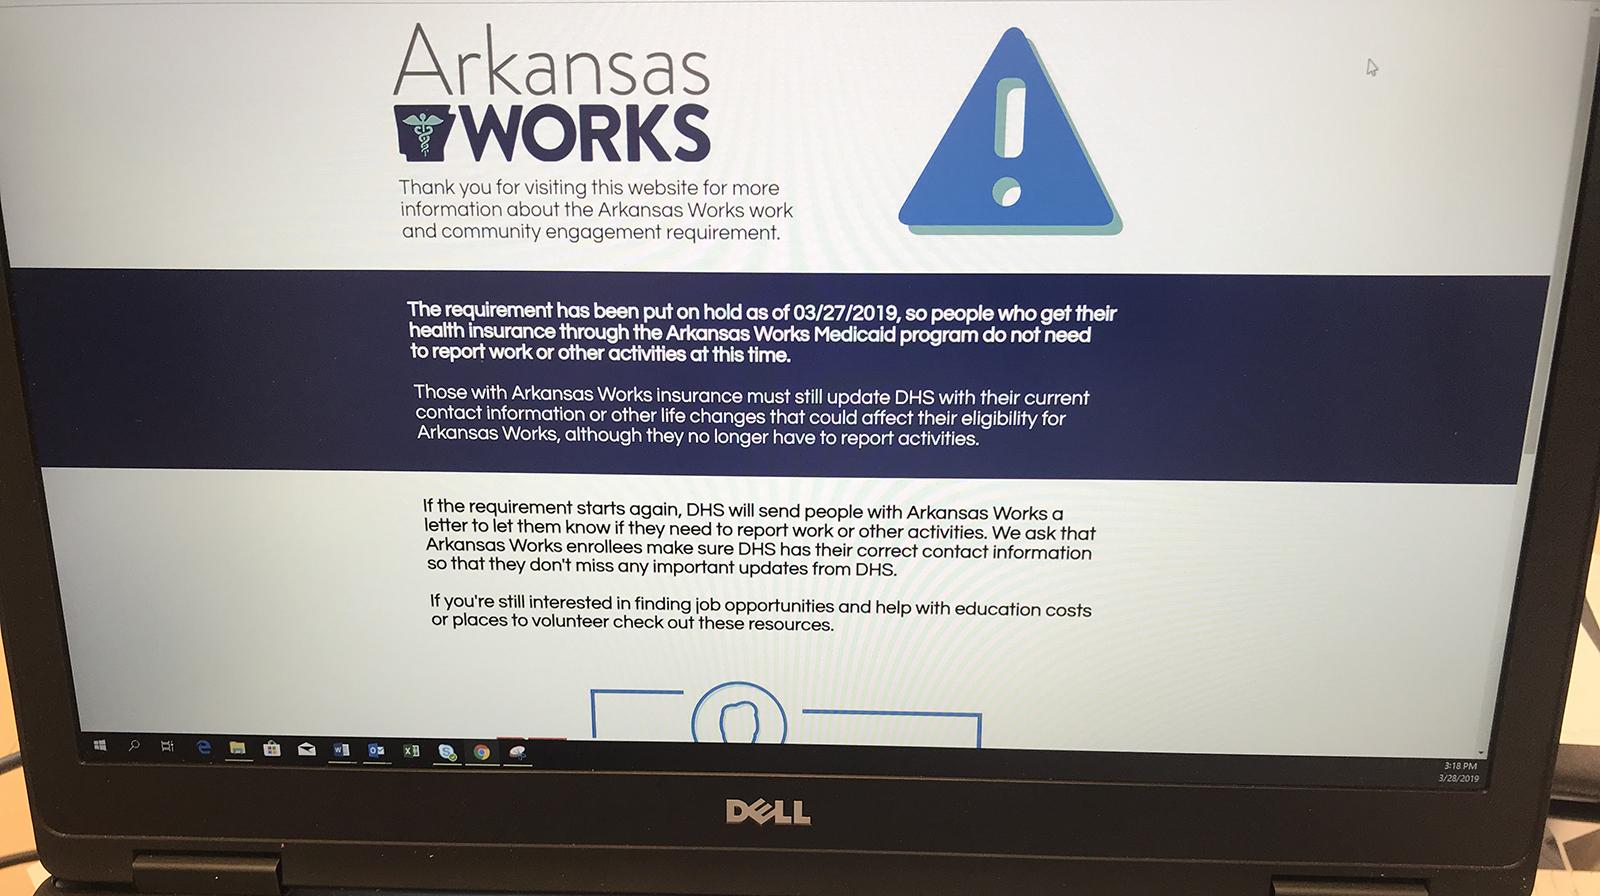 arkansas-works-site